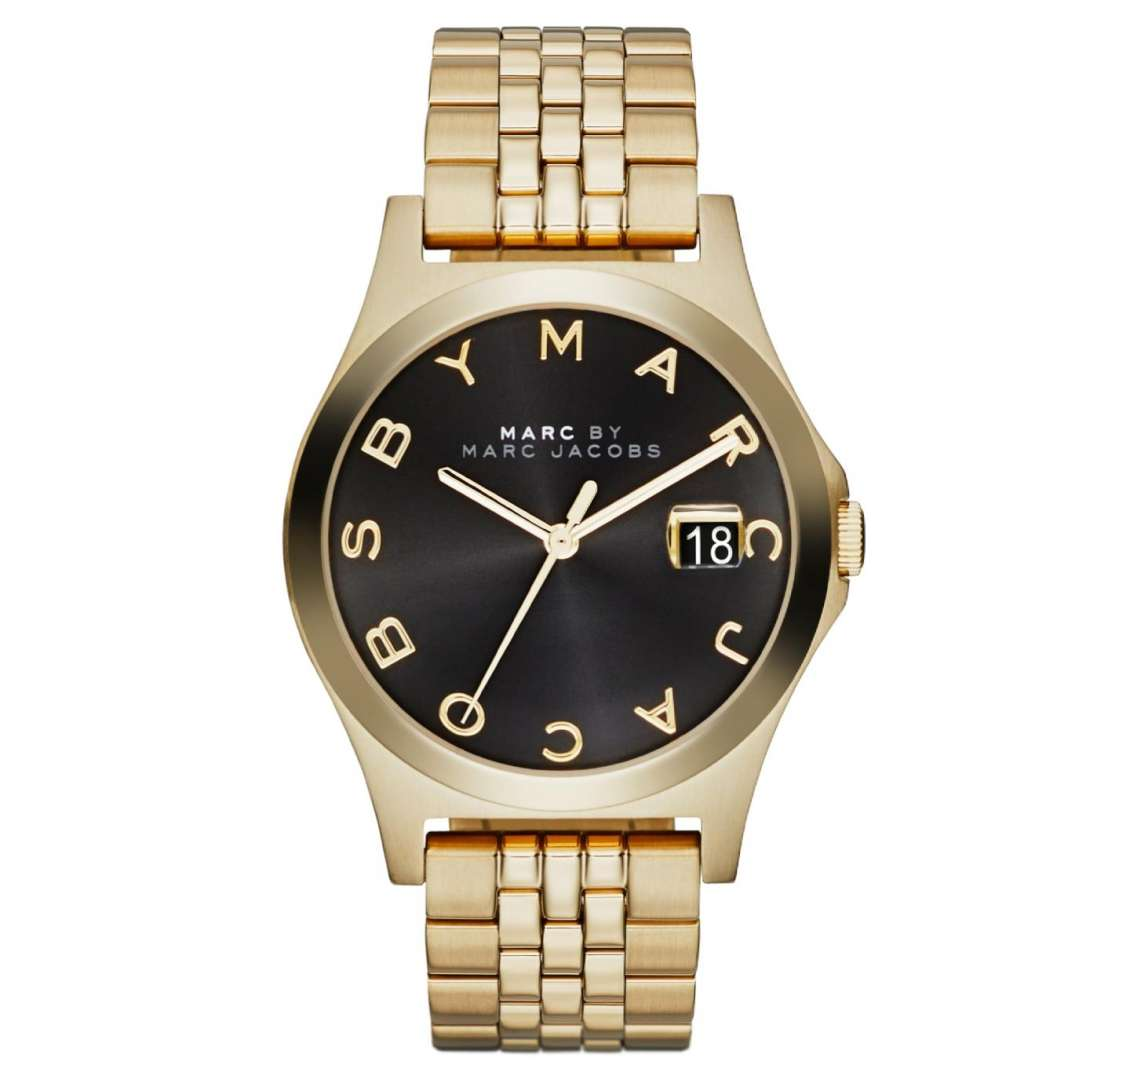 שעון יד אנלוגי mark jacobs דגם: mbm3315 מארק ג'ייקובס